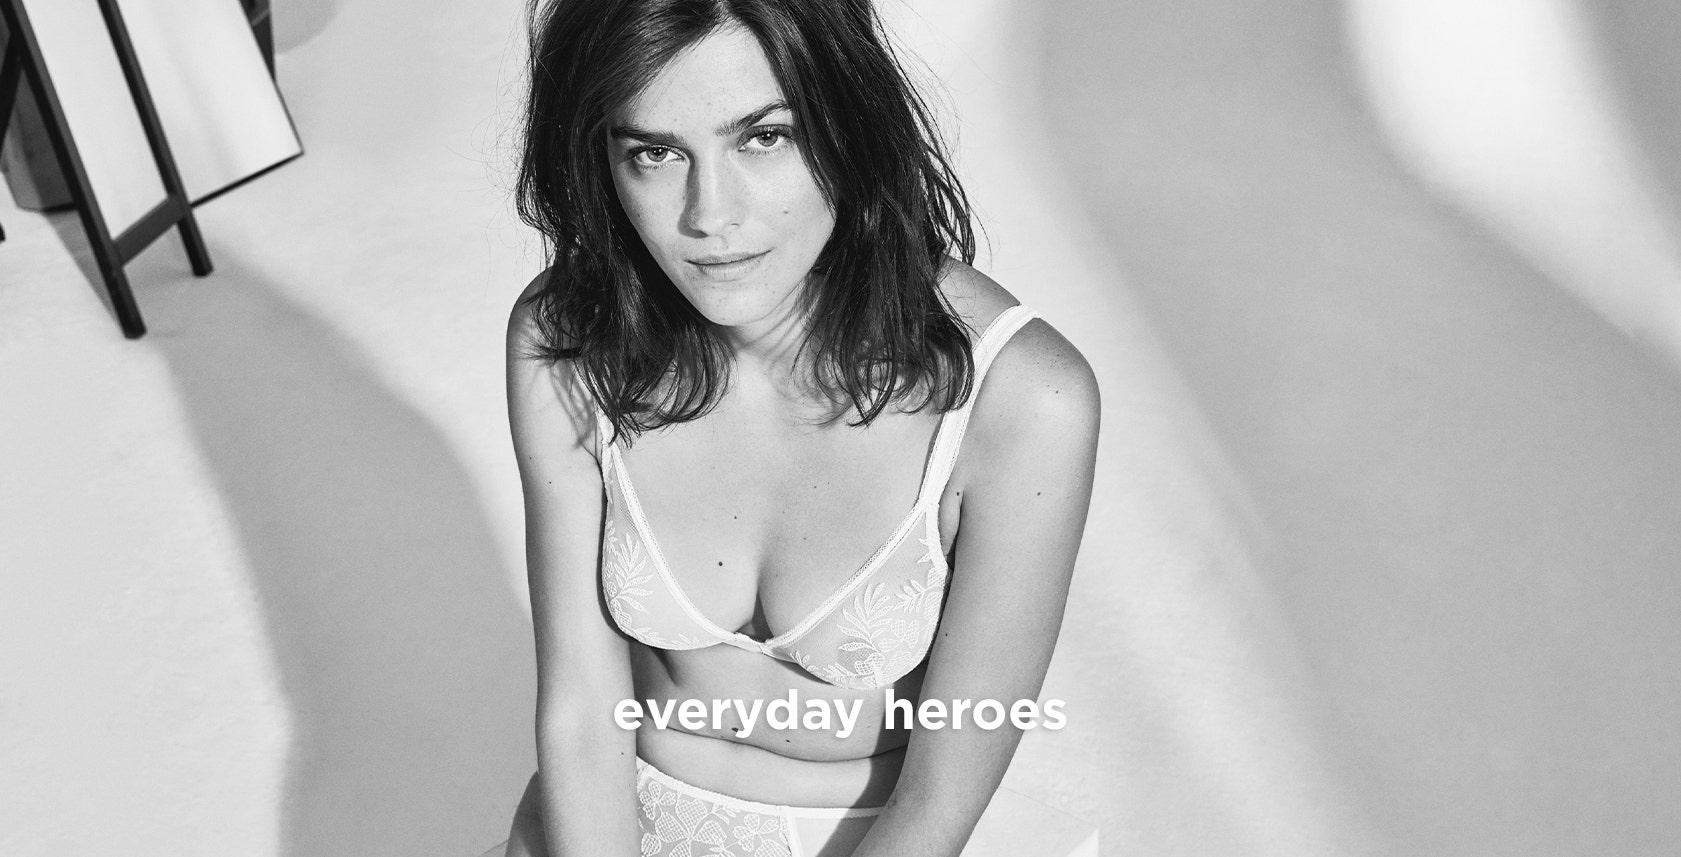 New chapter : everyday heroes by Simone Pérèle | Simone Pérèle